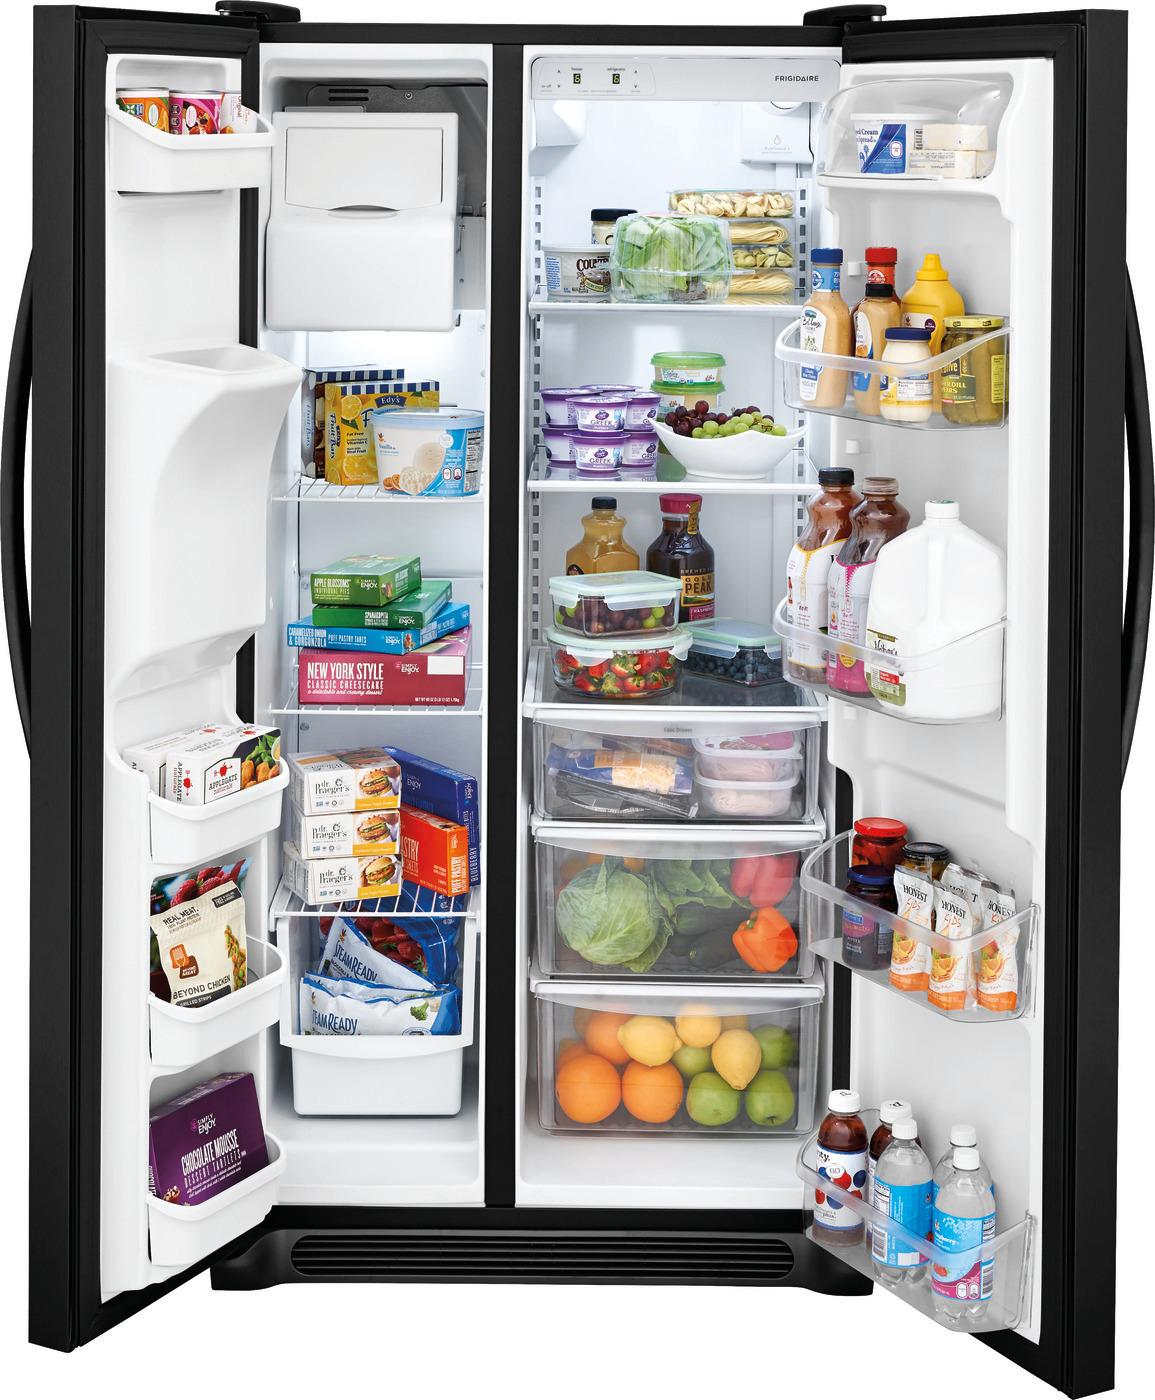 Compatible Door Bin for Frigidaire Refrigerator Model FFHS2611L